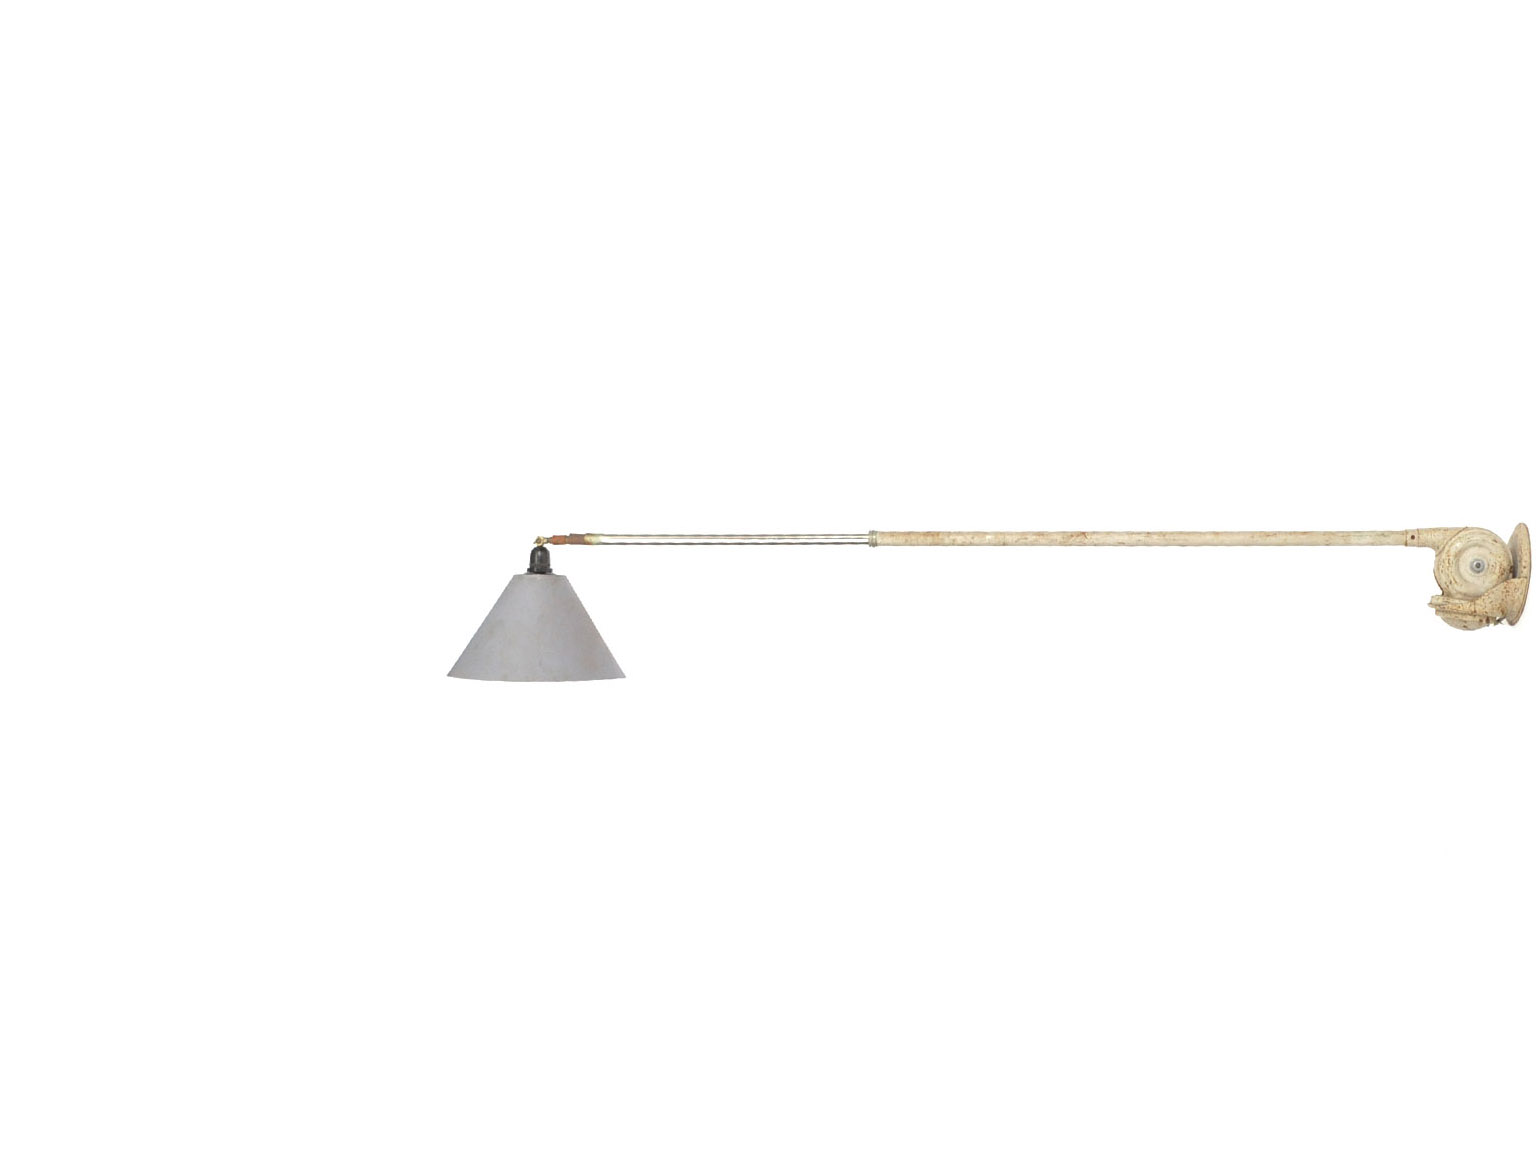 TRIPLEX WALL LAMP BY JOHAN PETTER JOHANSSON